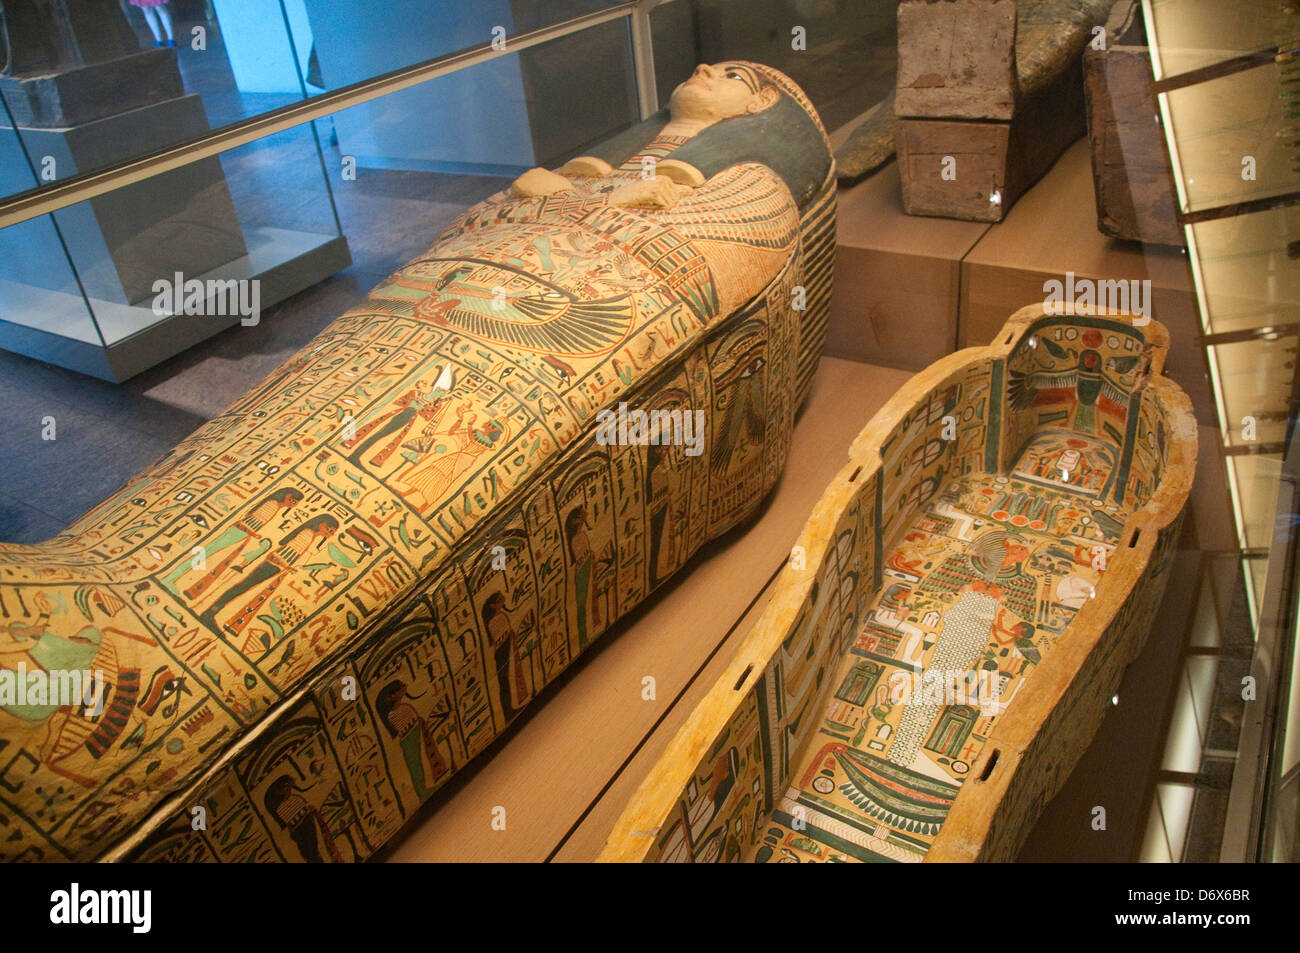 Metropolitan Museum Of Art Stock Photos Metropolitan: A Tomb In The Egyptian Gallery In The Metropolitan Museum